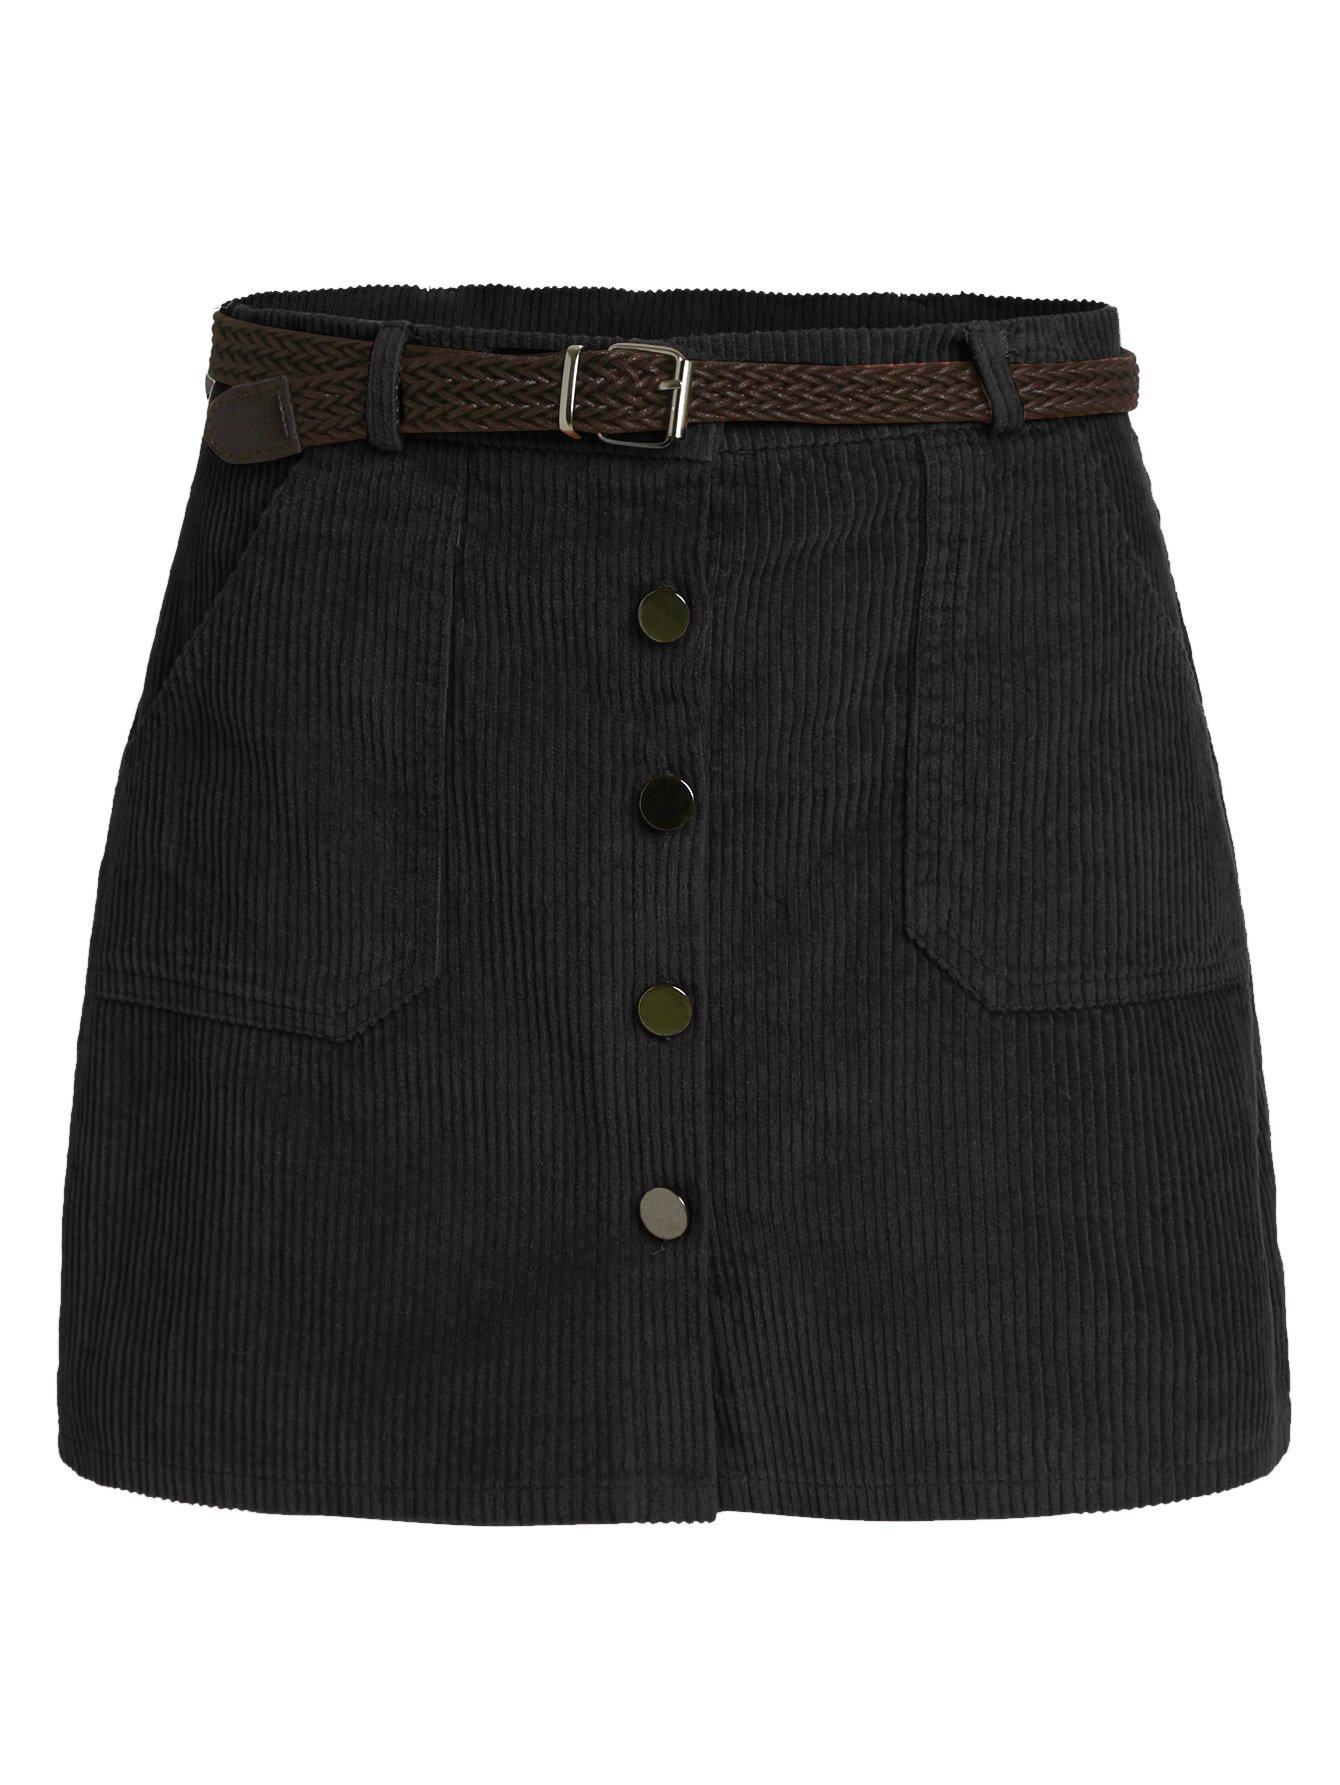 Romwe Women's Cute Mini Corduroy Button Down Pocket Skirt with Belt Black L